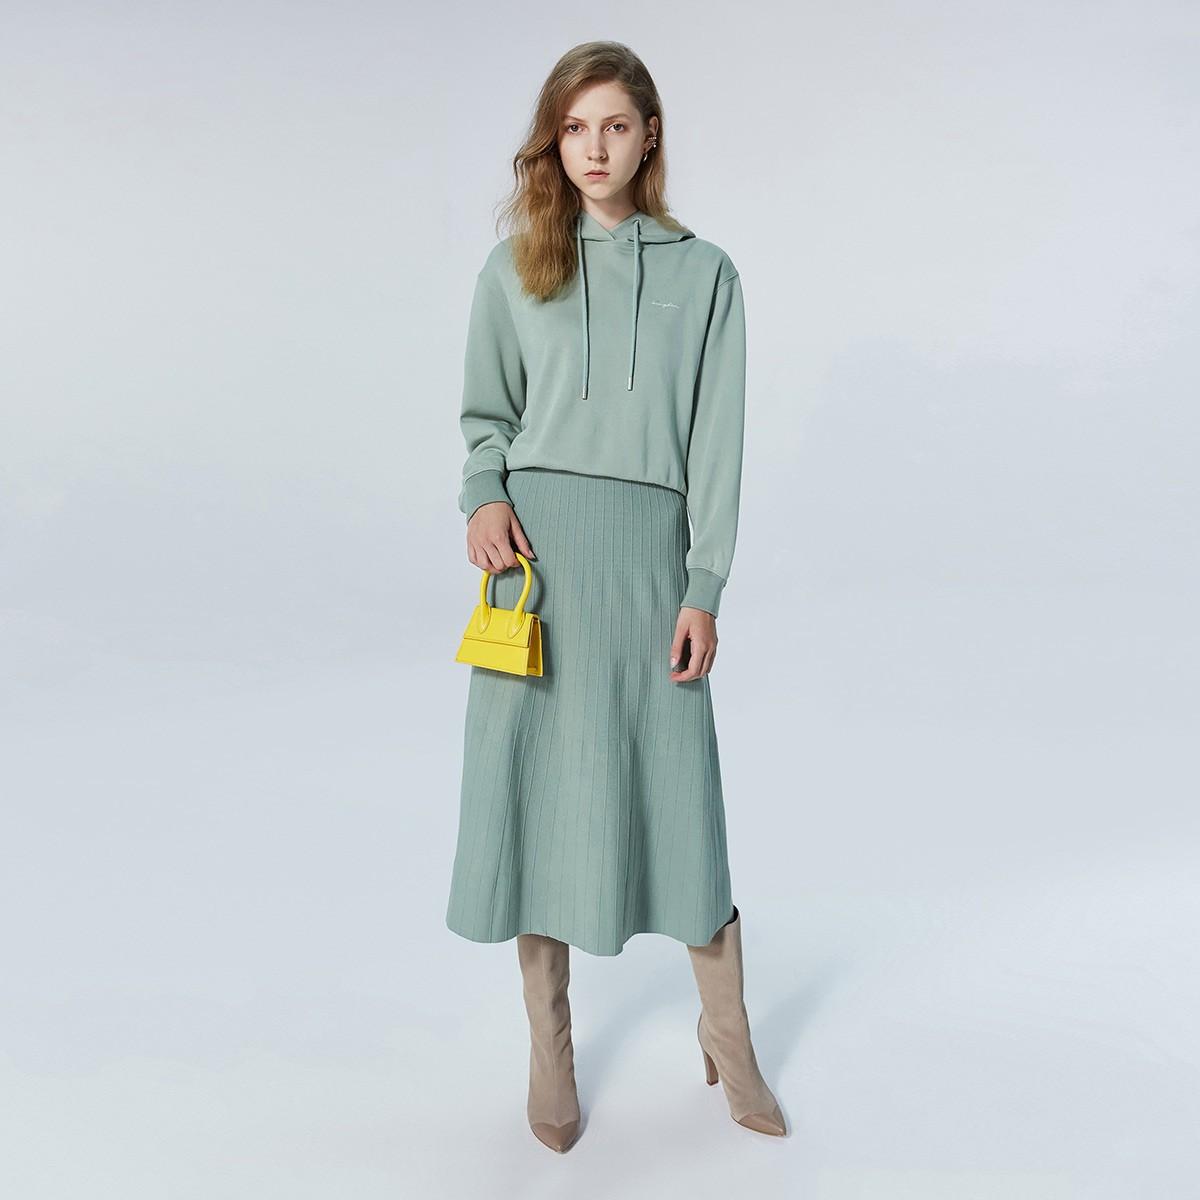 1ZH4035070 女士针织裙